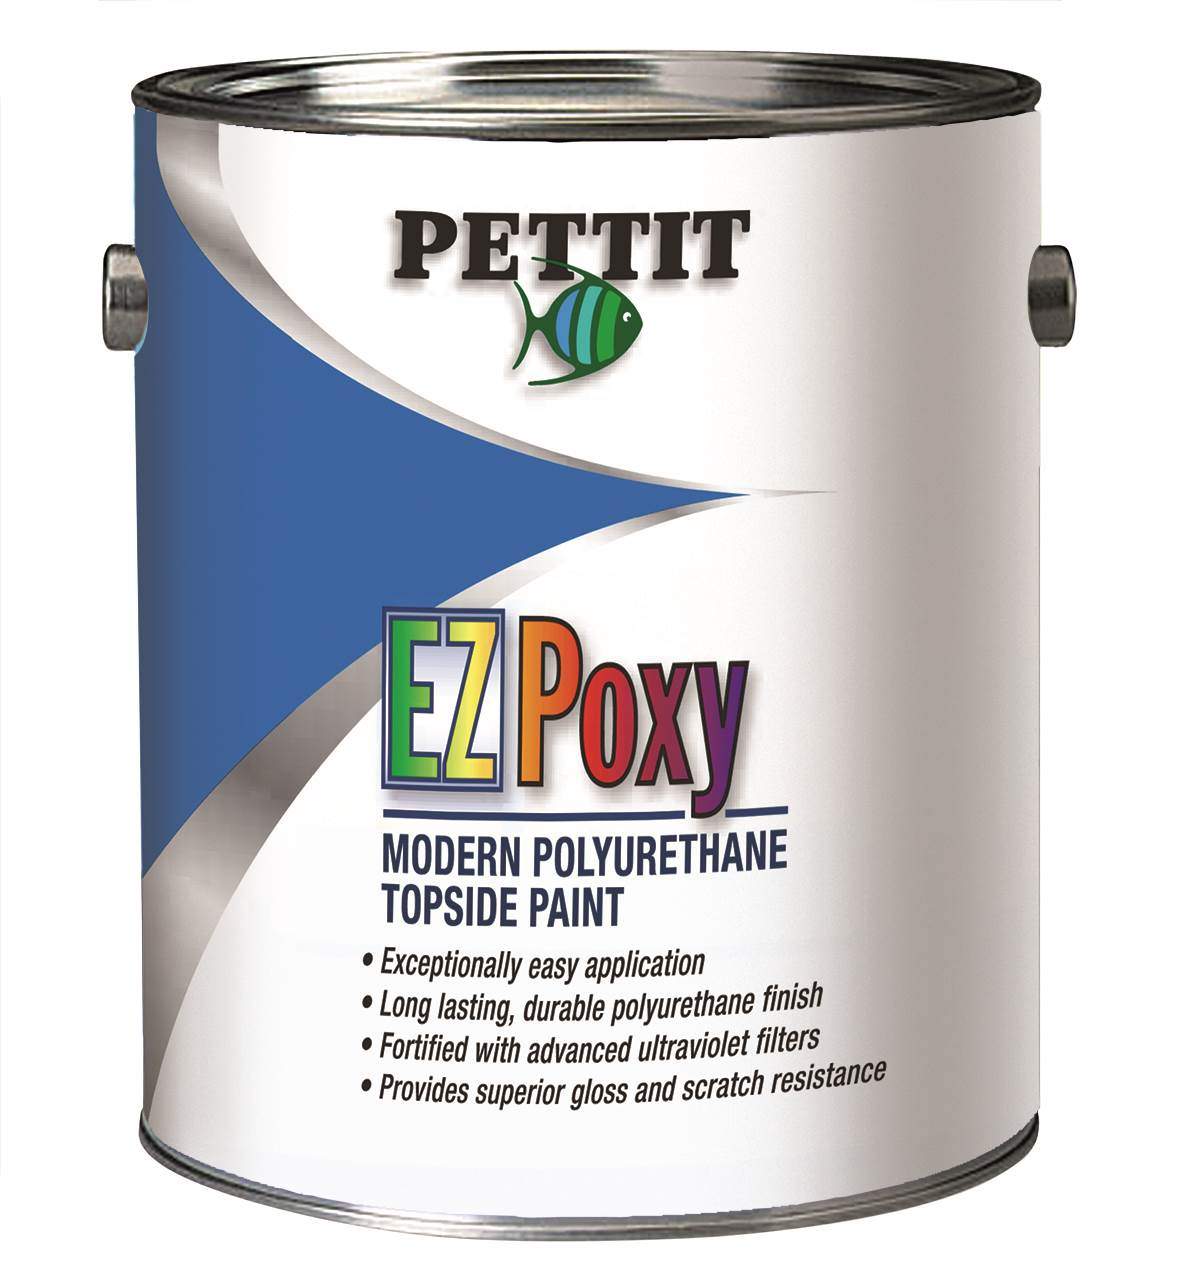 Pettit Easypoxy Ez Poxy Topside Boat Paint